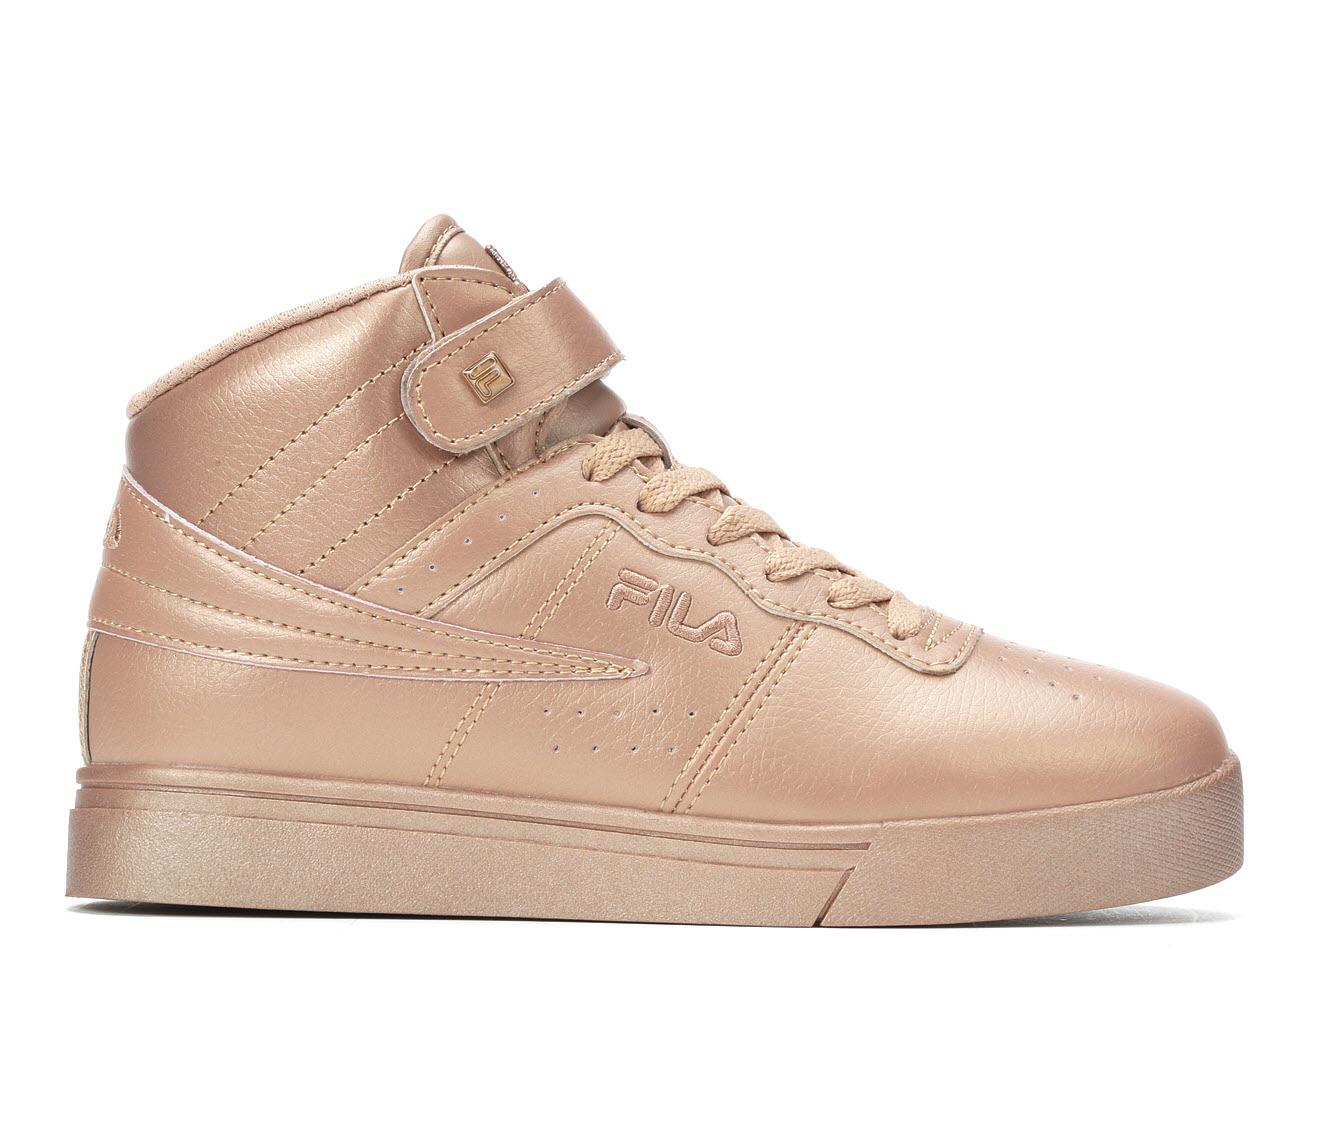 Fila Vulc 13 MP Metallic Stars Women's Athletic Shoe (Pink)